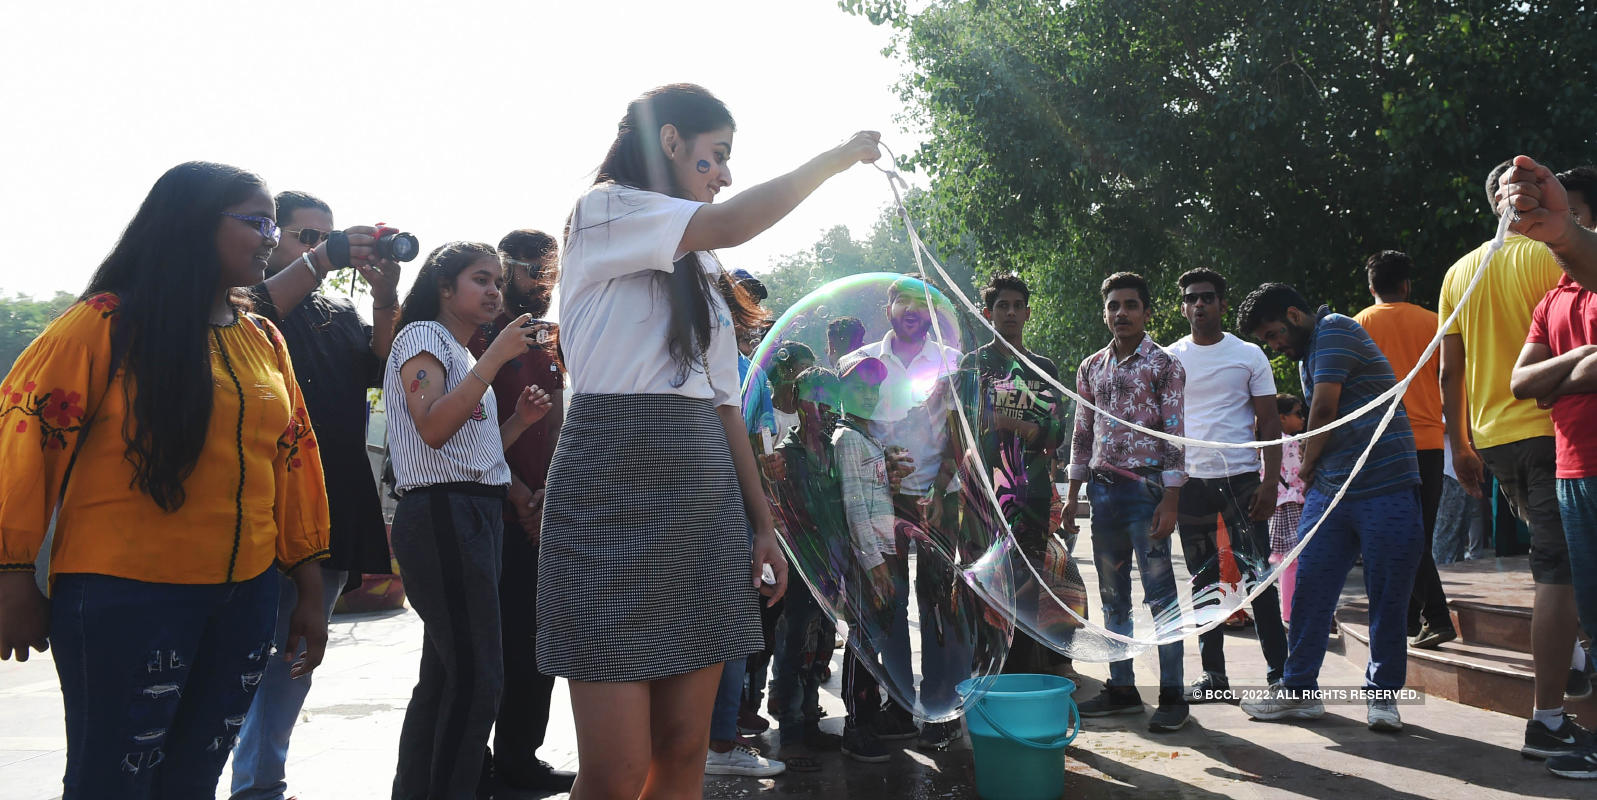 Delhiite participate in 'The Bubble Parade' to break silence around child sexual abuse